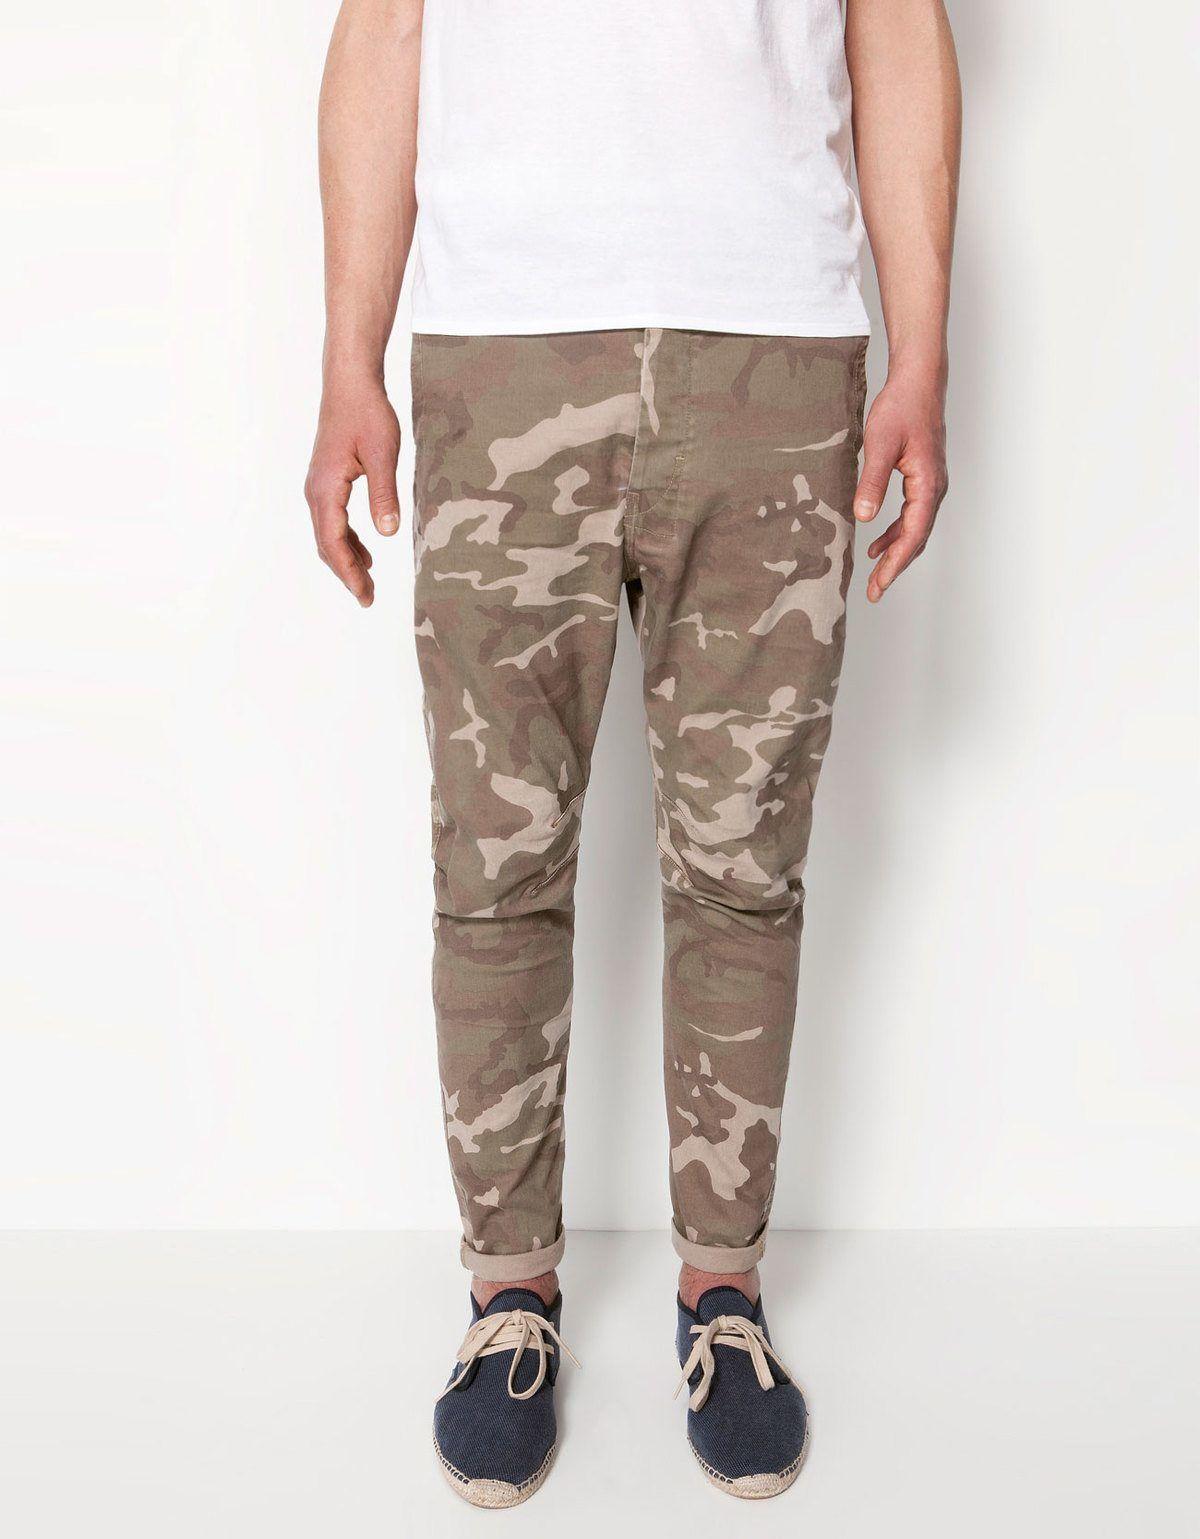 tendencias-pantalon-hombre-verano-2013-bershka-estampados